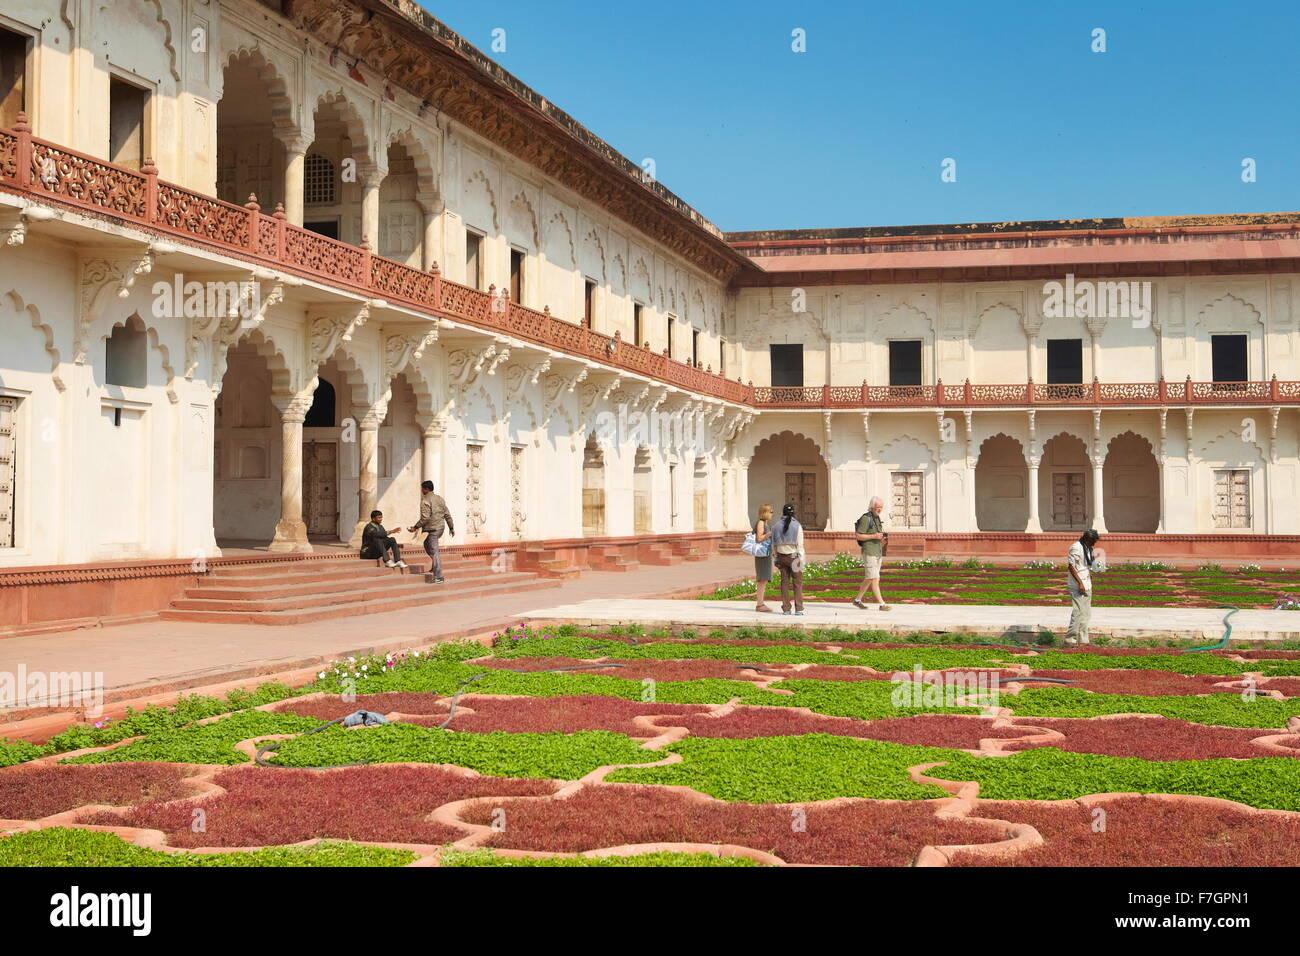 Fuerte Rojo, Agra - Anguri Bagh jardines, Agra, India Imagen De Stock